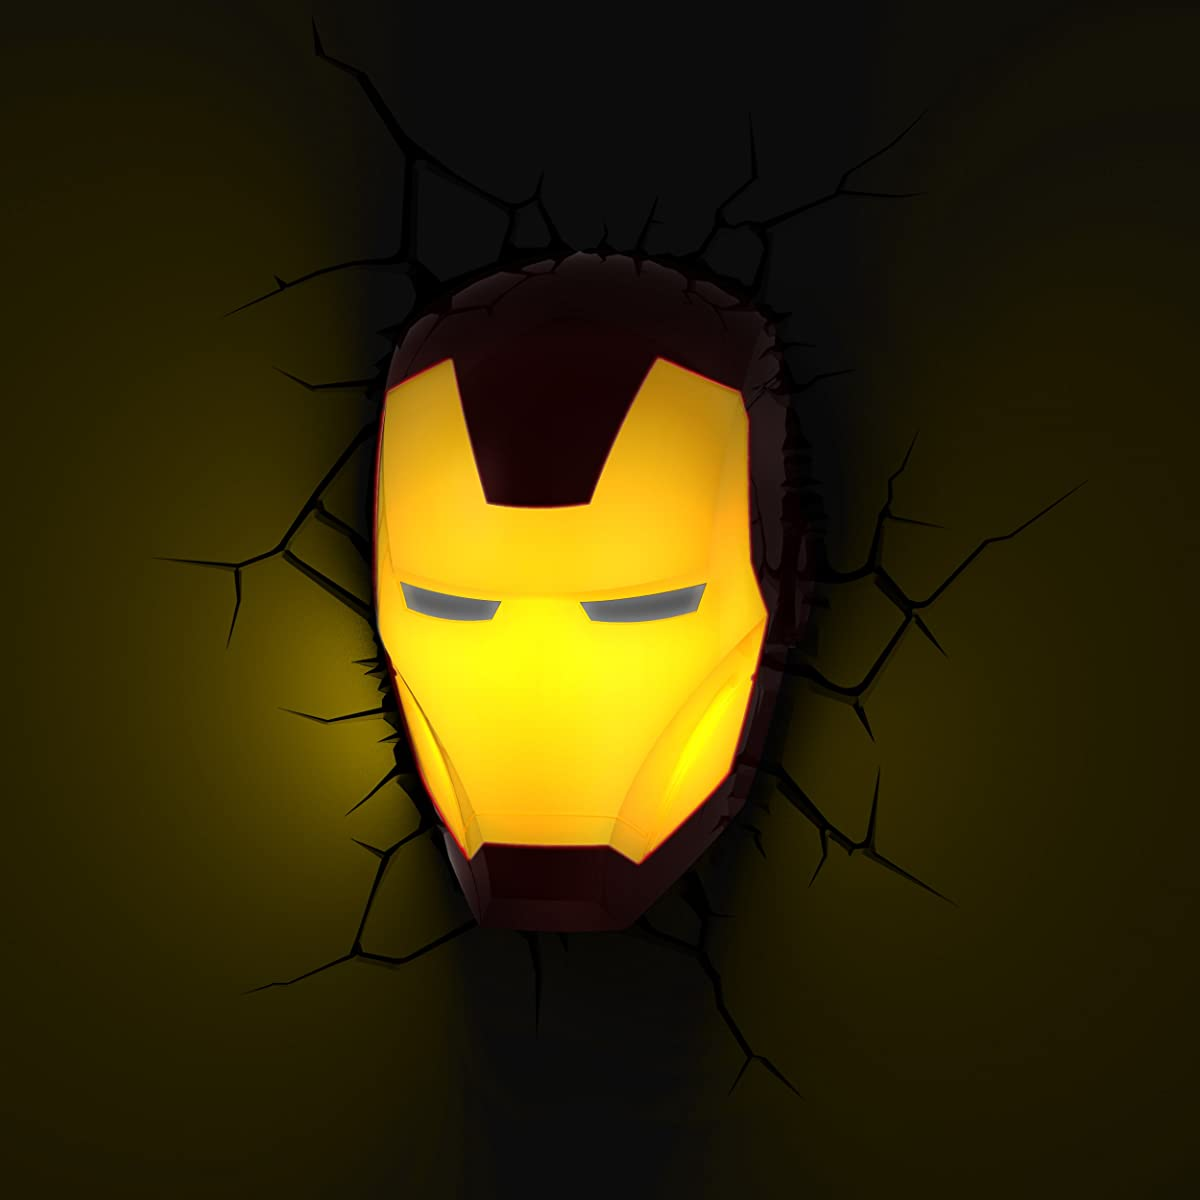 3D Light FX Marvel Mini 3D Deco Wall LED Night Light with Crack Wall ...